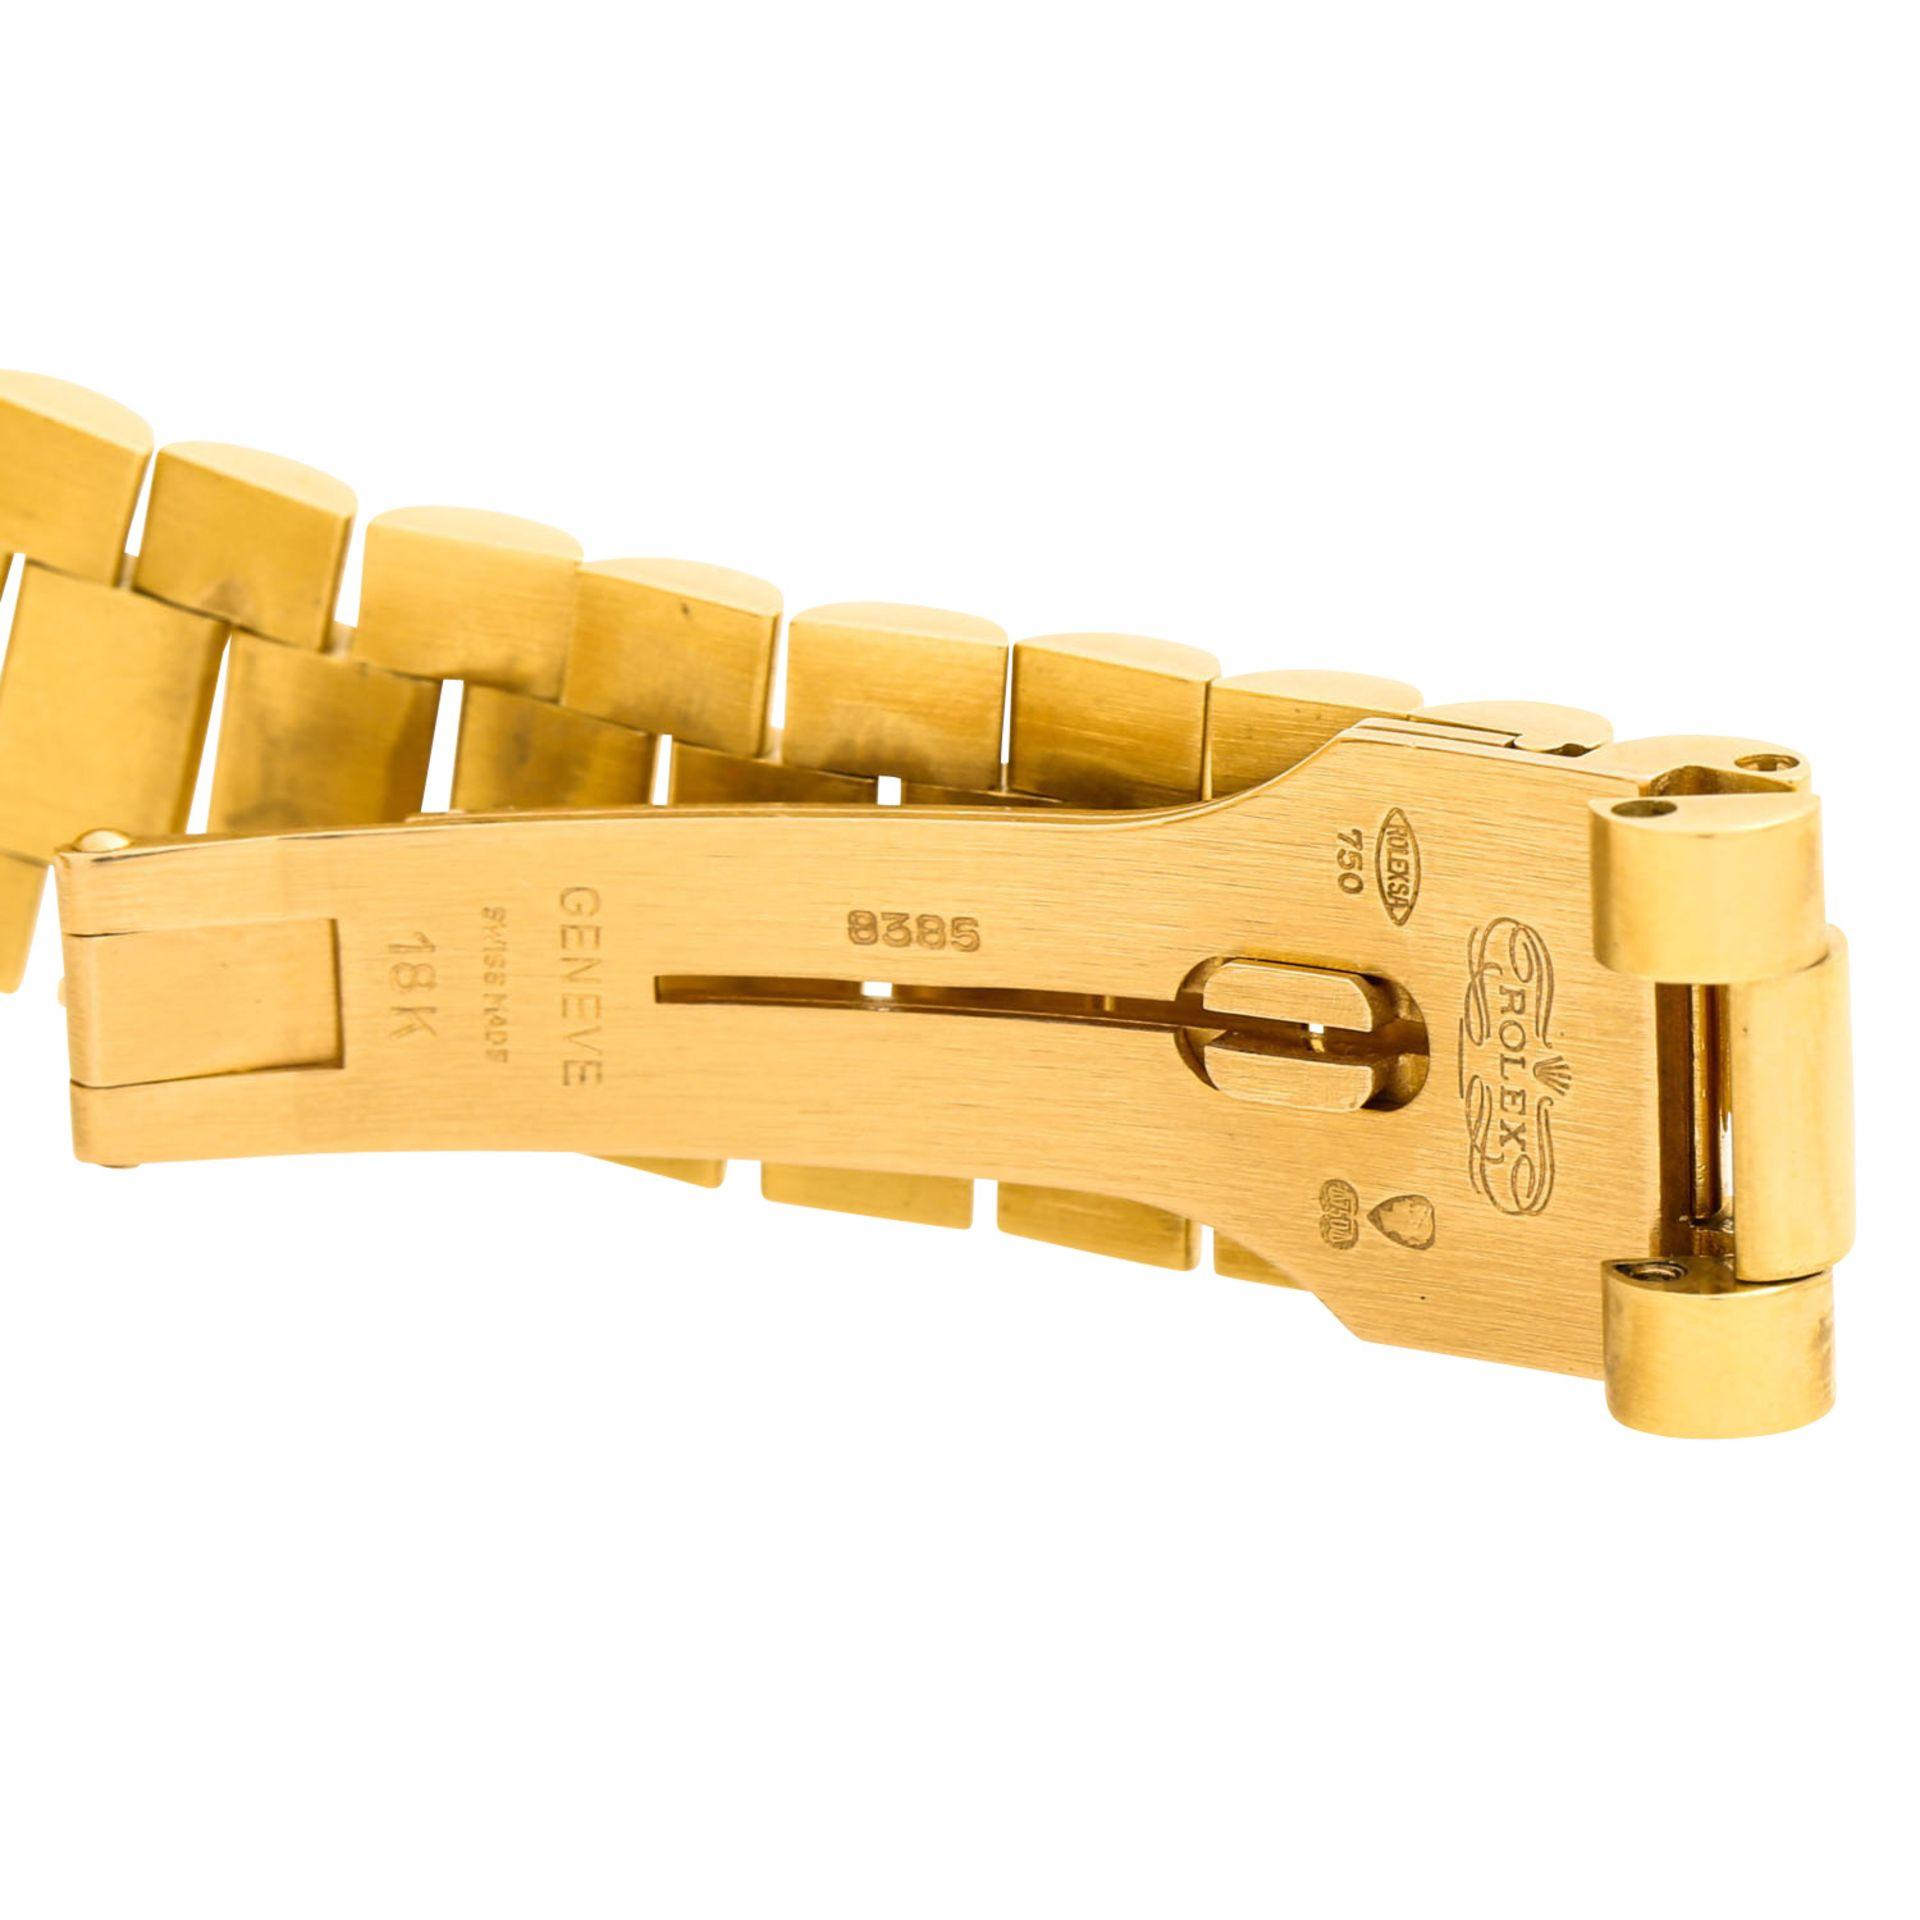 "ROLEX Vintage DayDate ""Sternenhimmel"", Ref. 18038. Armbanduhr. Gold 18K, Ziffernblatt - Image 6 of 8"